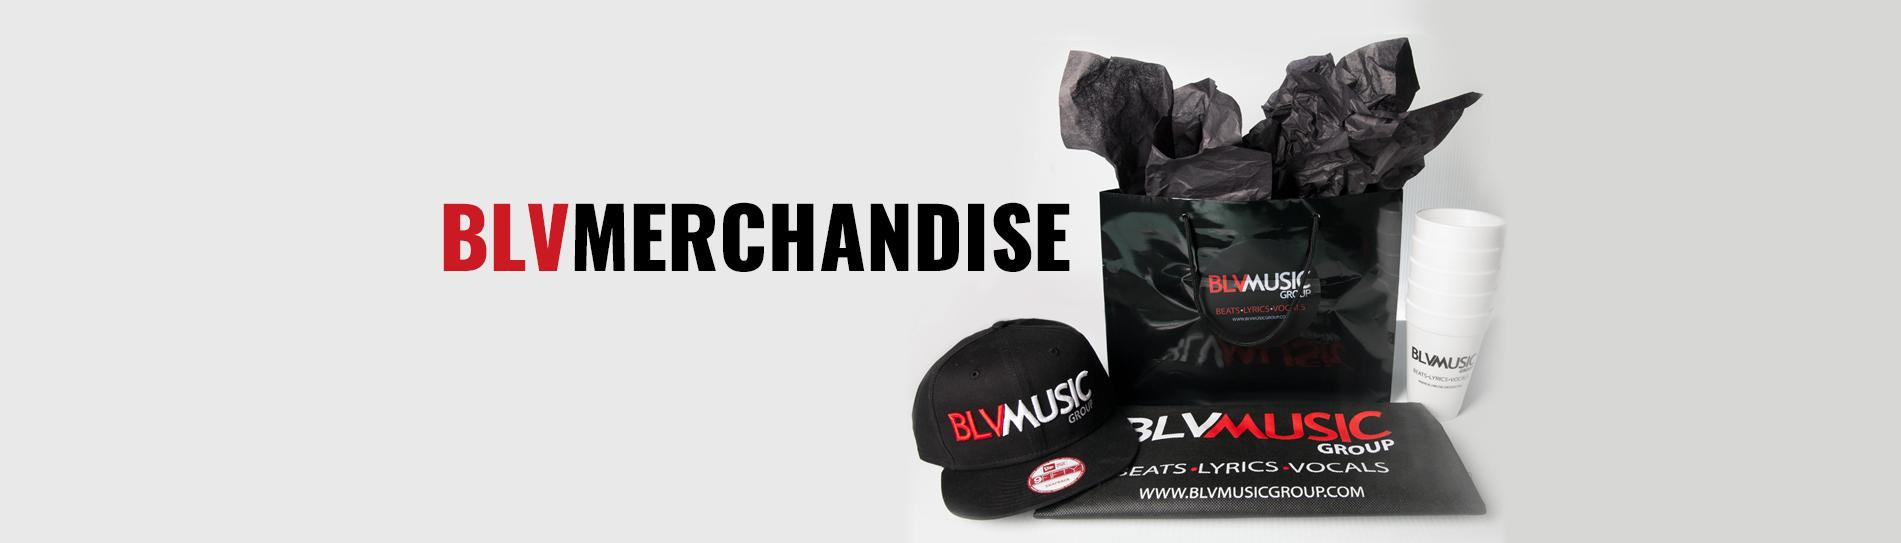 http://www.blvmusicgroup.com/wp-content/uploads/2015/10/merchandise.jpg